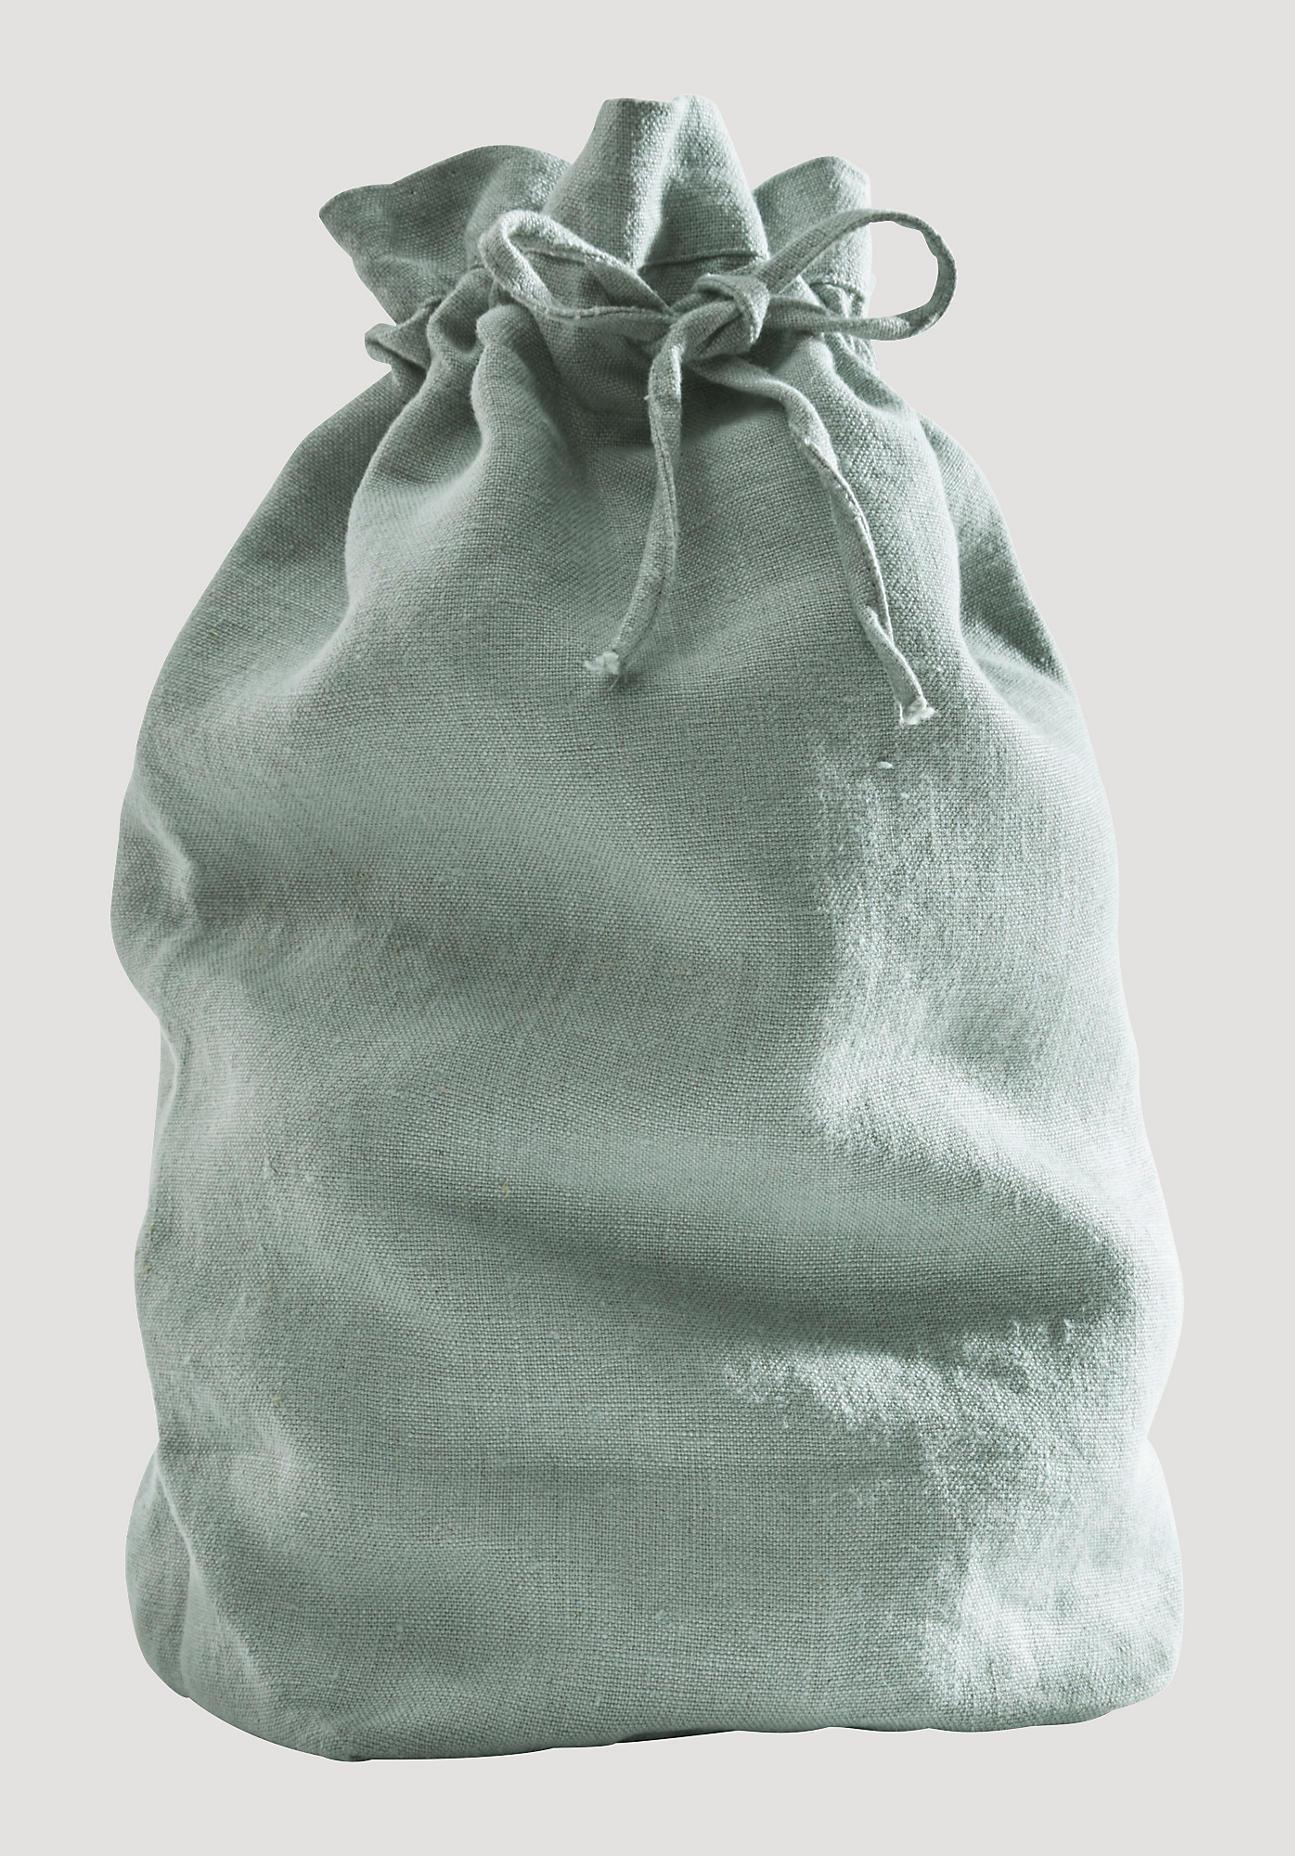 hessnatur Brotbeutel aus Leinen – grün – Größe 33x42,5 cm